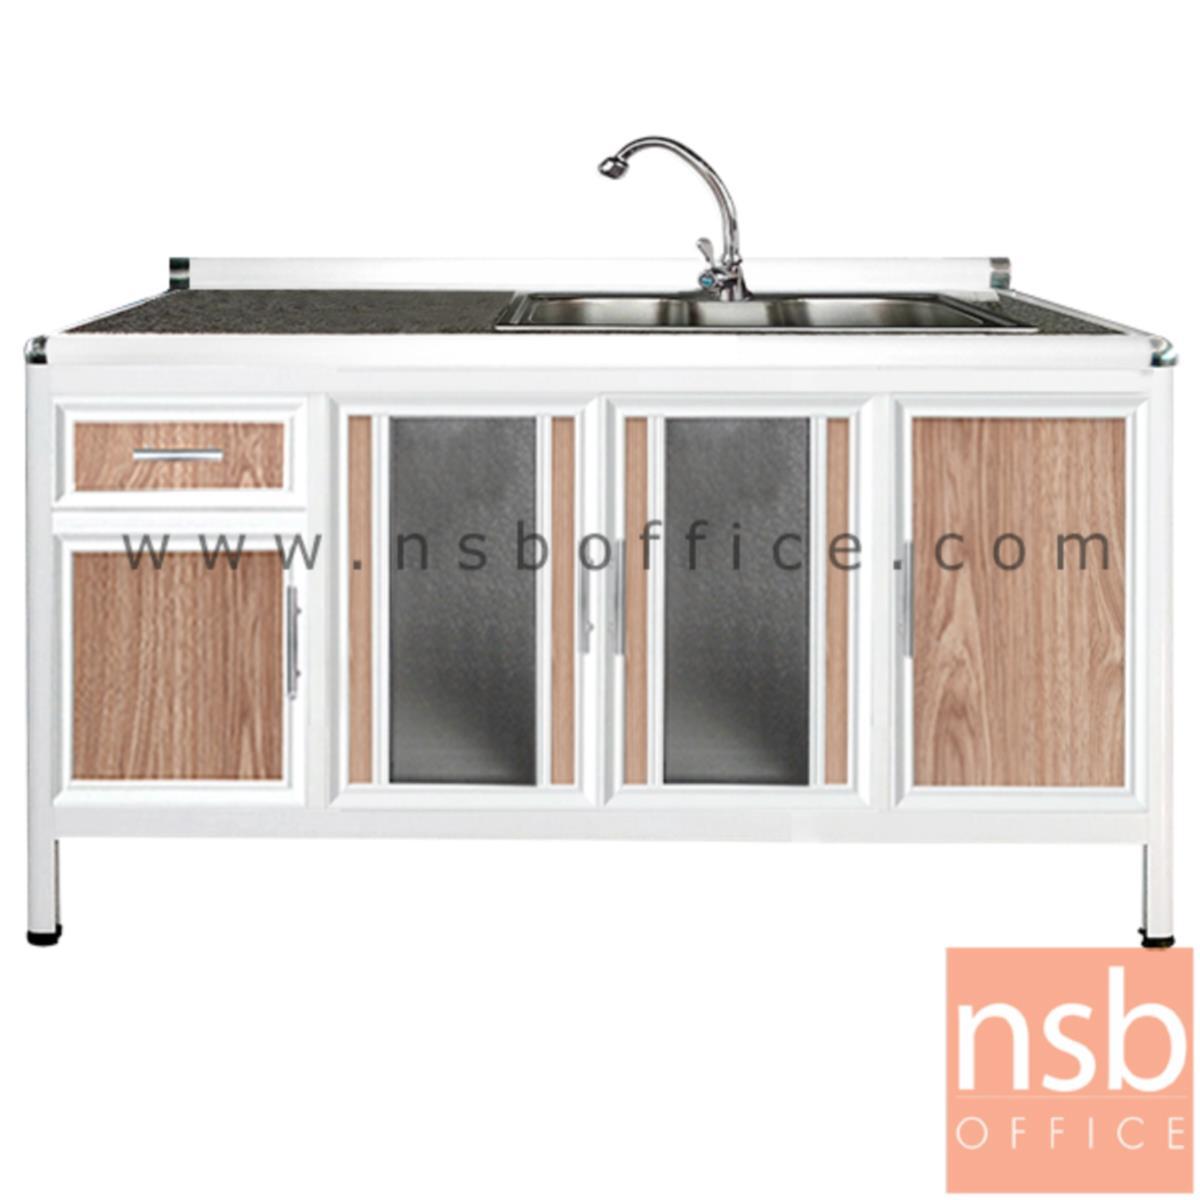 G07A135:ตู้ครัวตอนล่างอลูมิเนียมอ่างซิงค์ 1 หลุมลึก   กว้าง 160 ซม